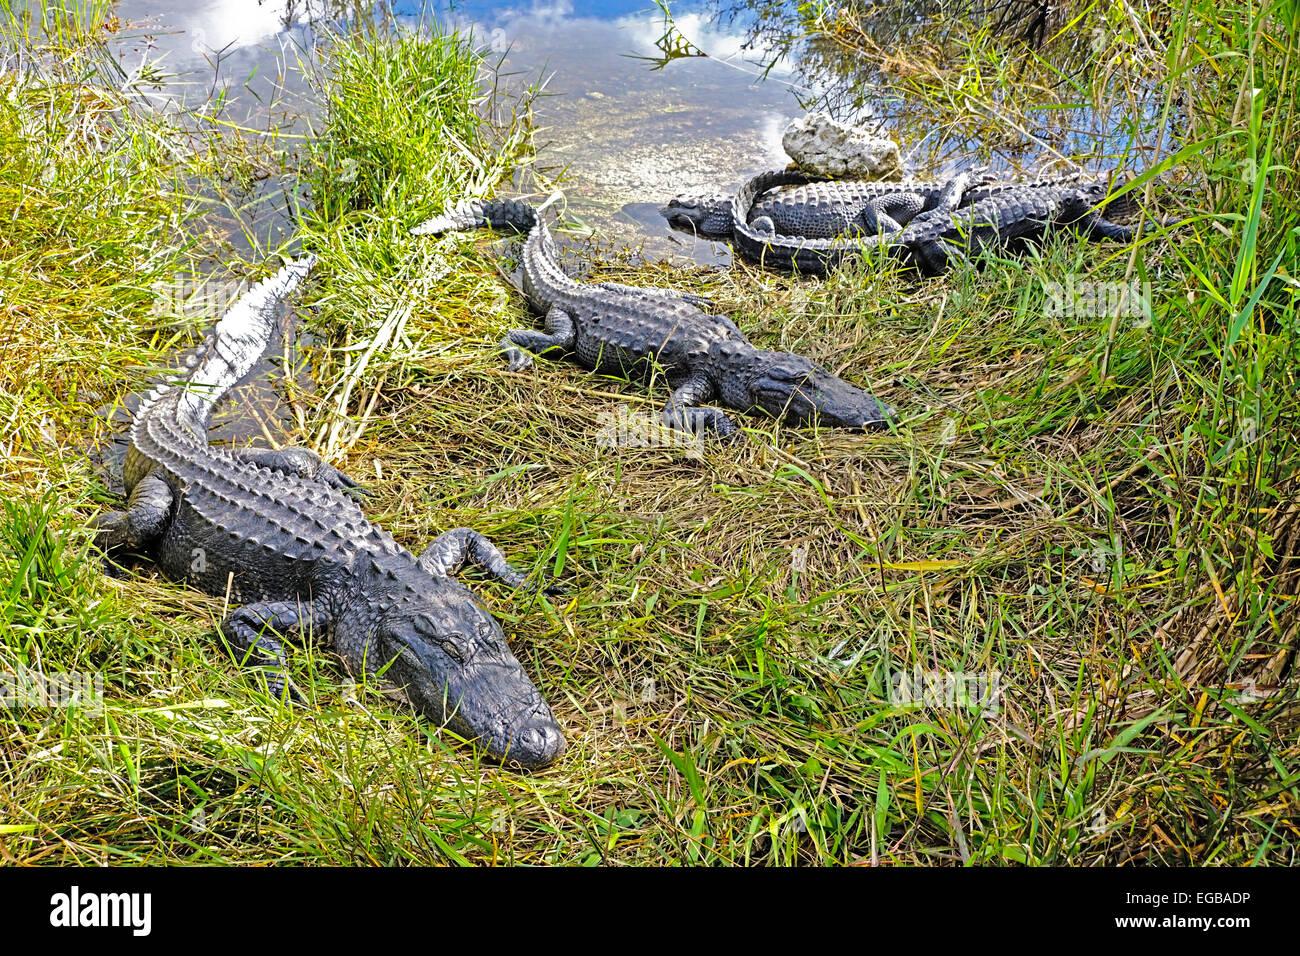 American alligators (alligator mississippiensis) at Everglades National Park, Florida. - Stock Image